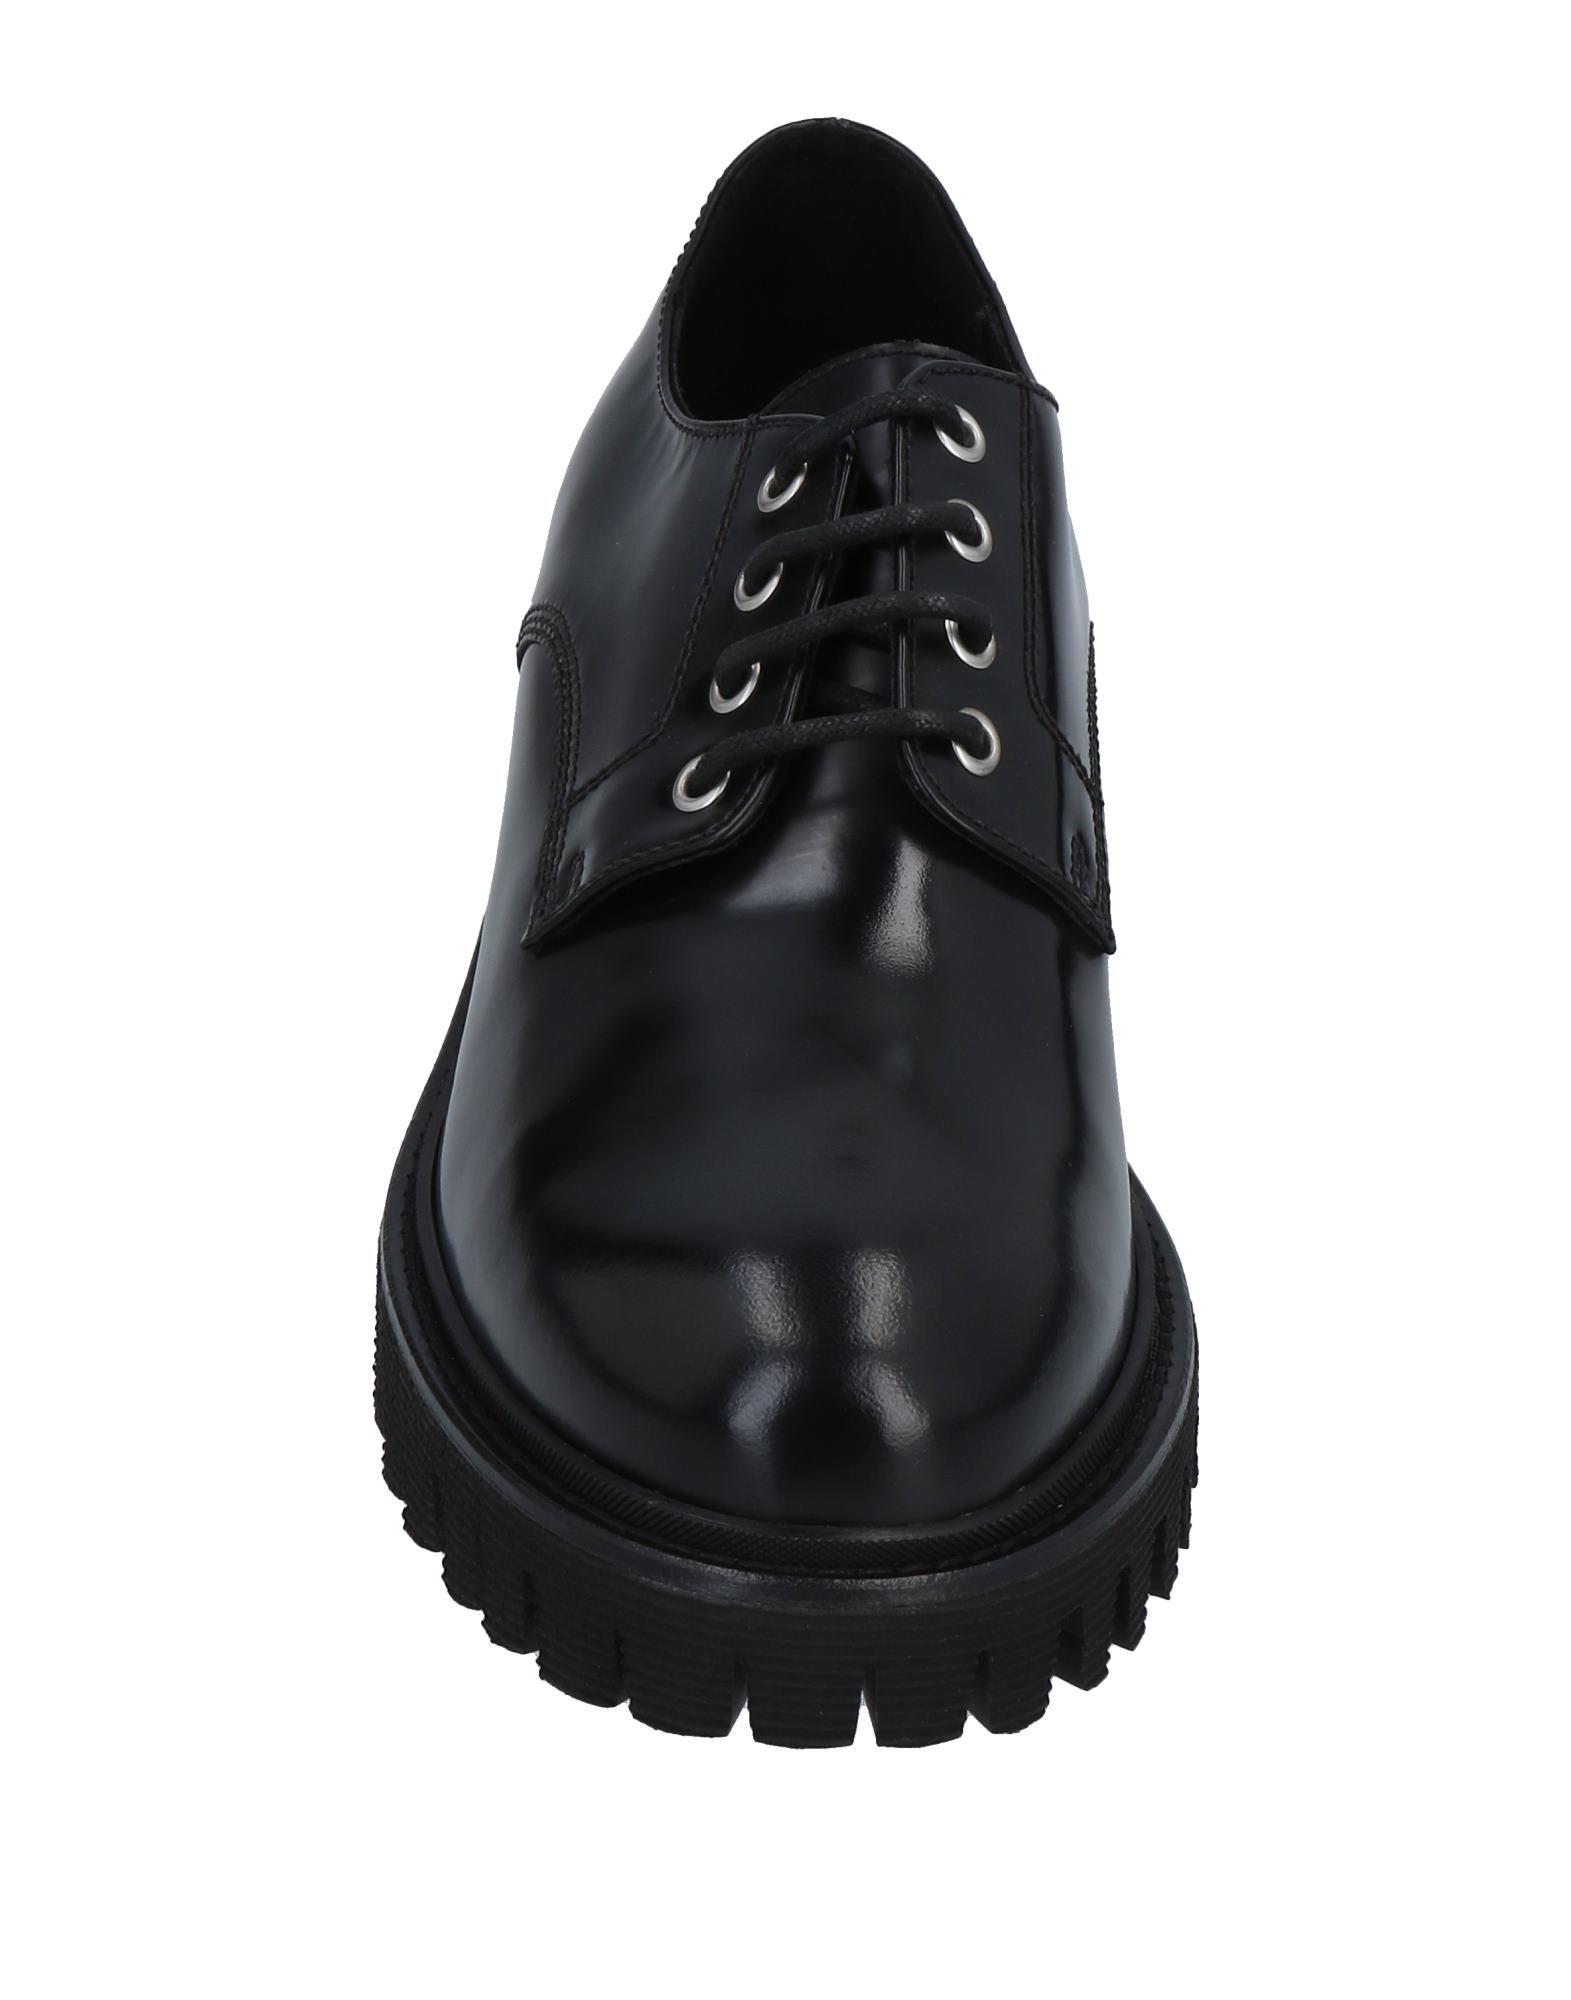 Herren Cult Schnürschuhe Herren   11477422KM Heiße Schuhe 6797cd